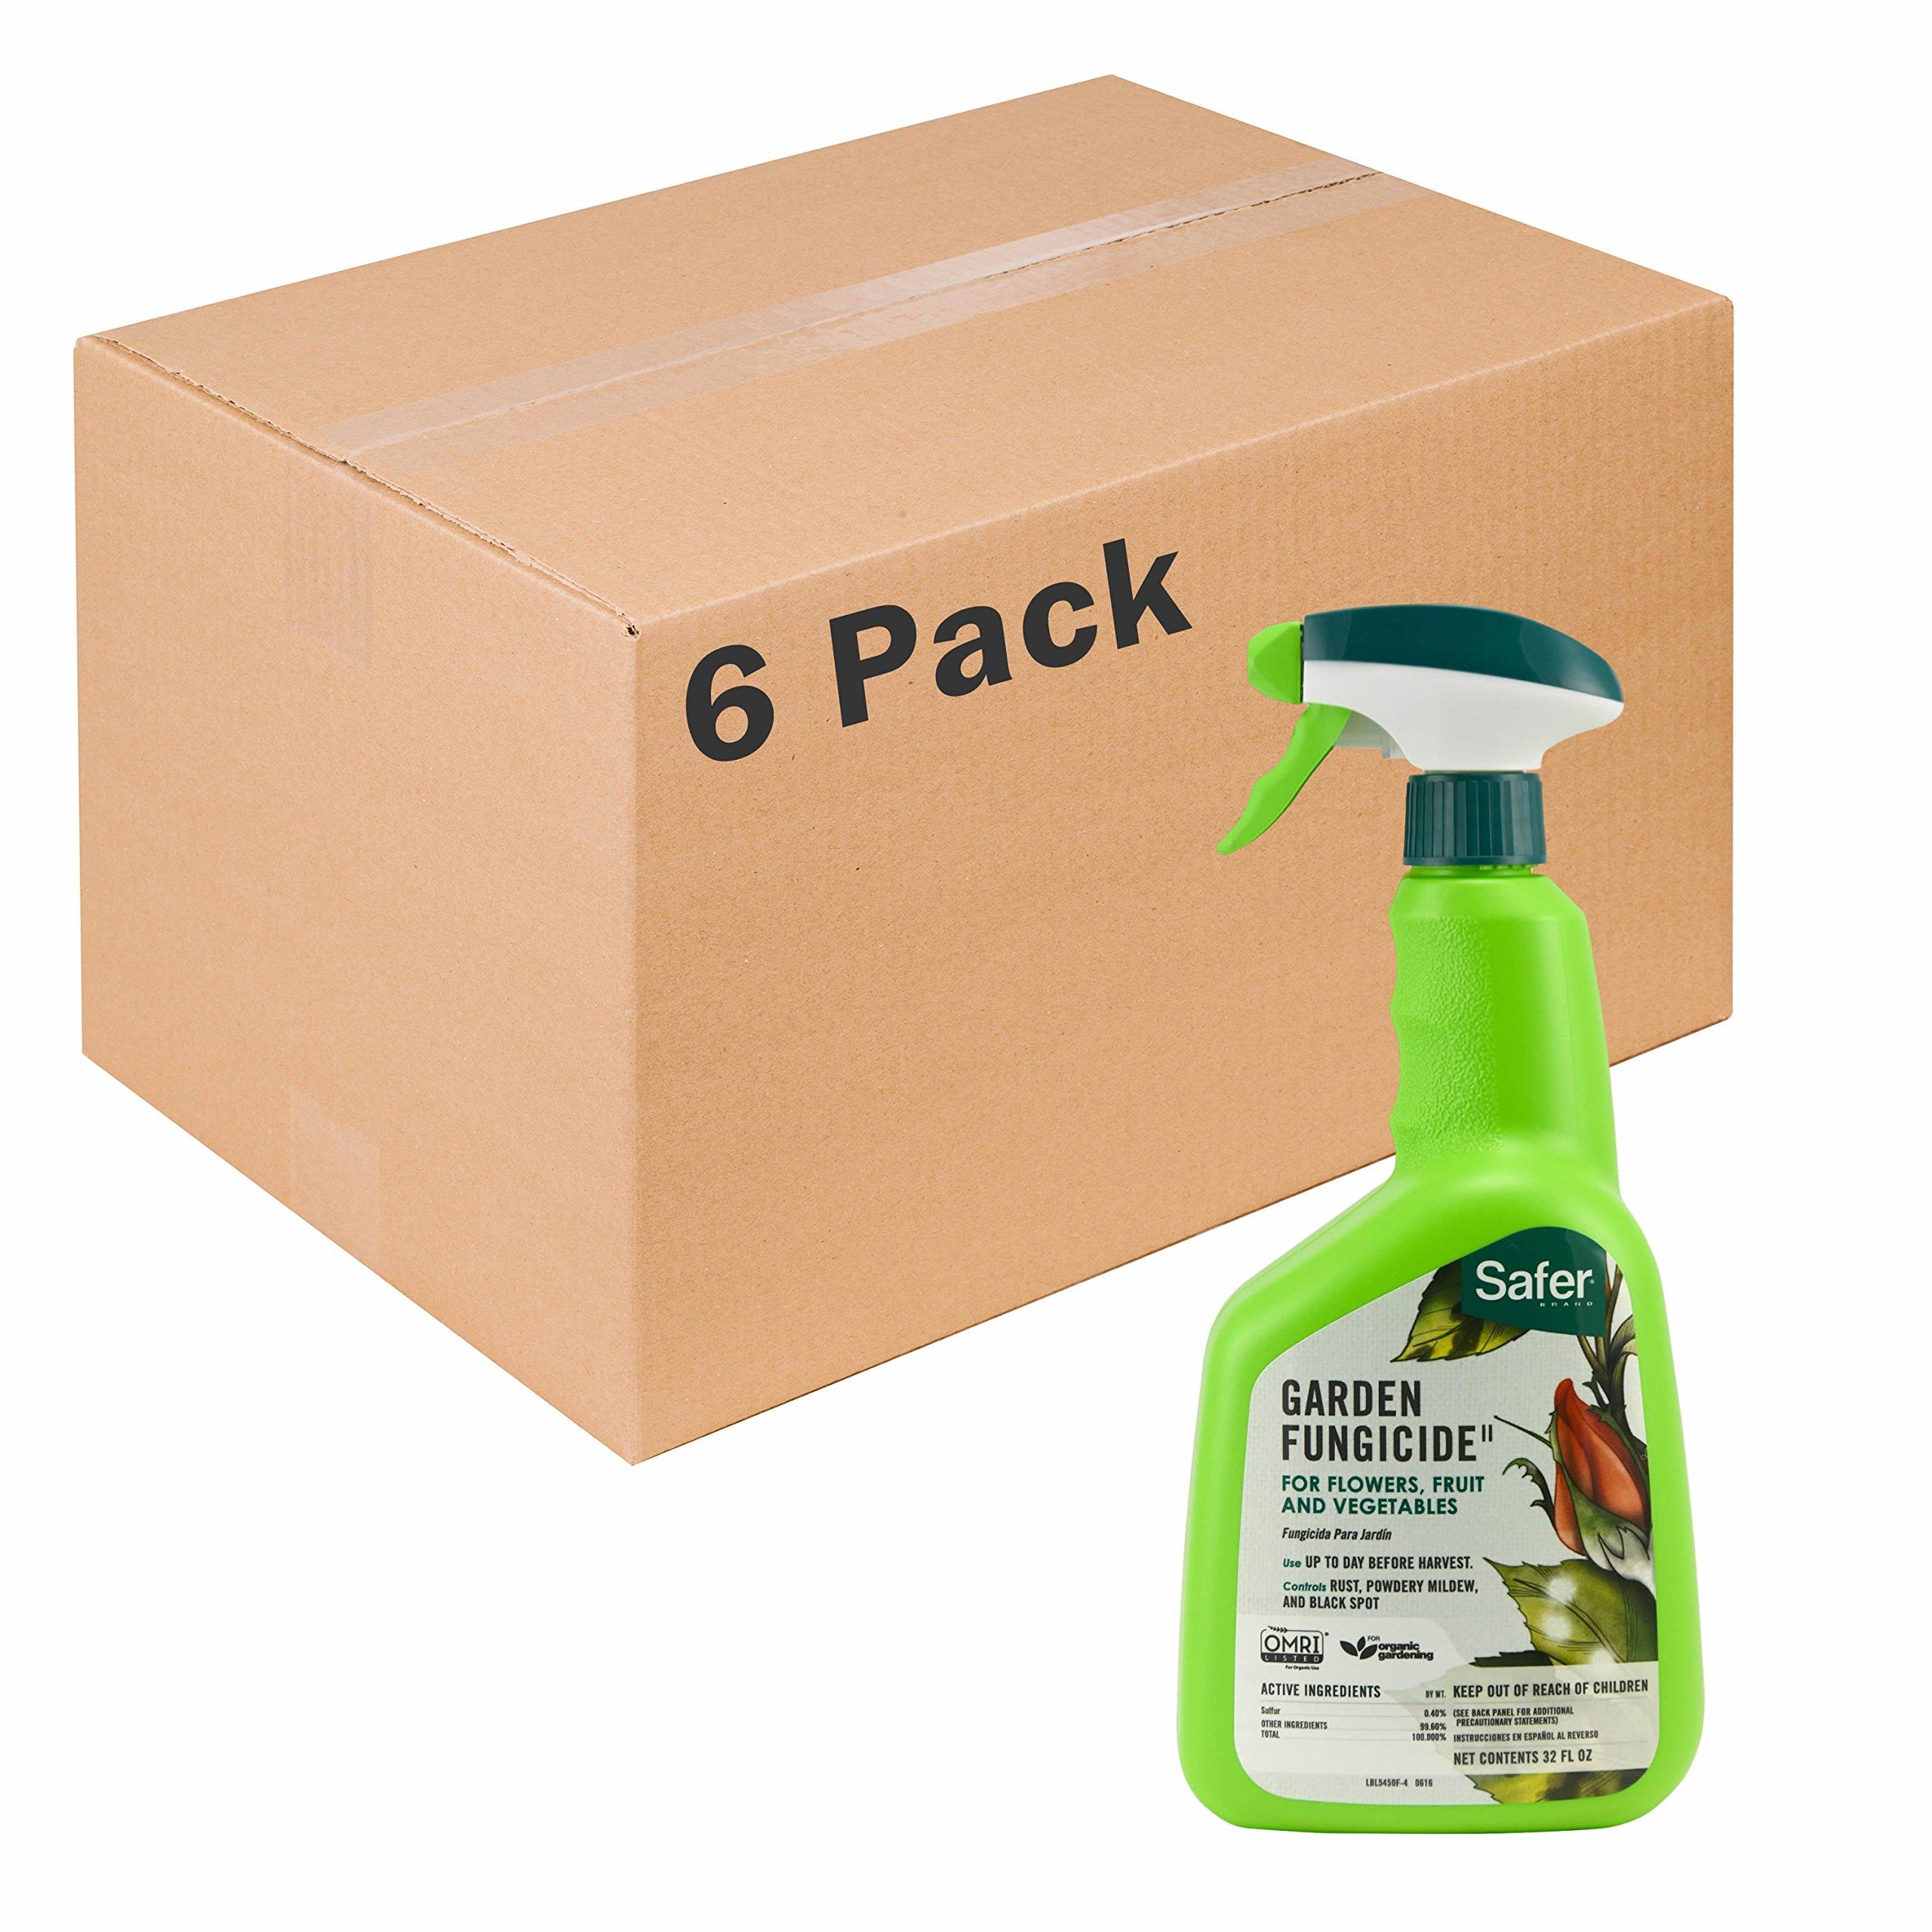 Garden Fungicide 32oz RTU by Safer Brand - 6 pack 5450-6